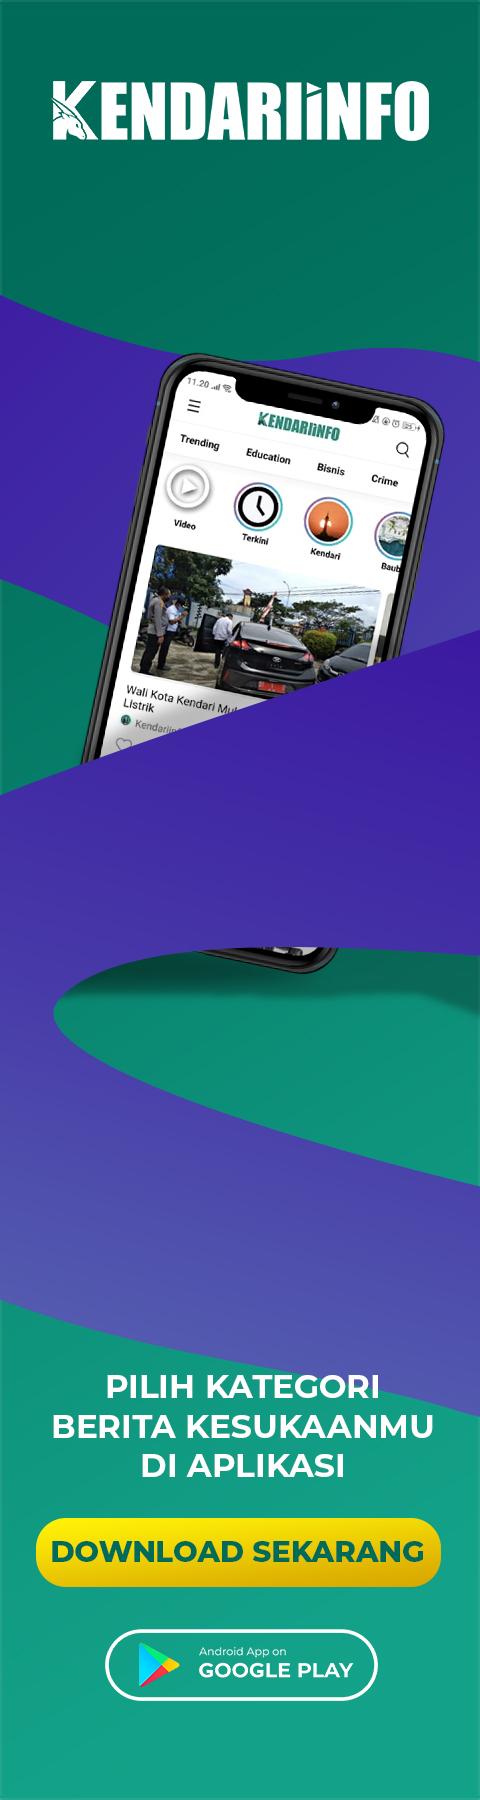 Banner melayang aplikasi kendariinfo